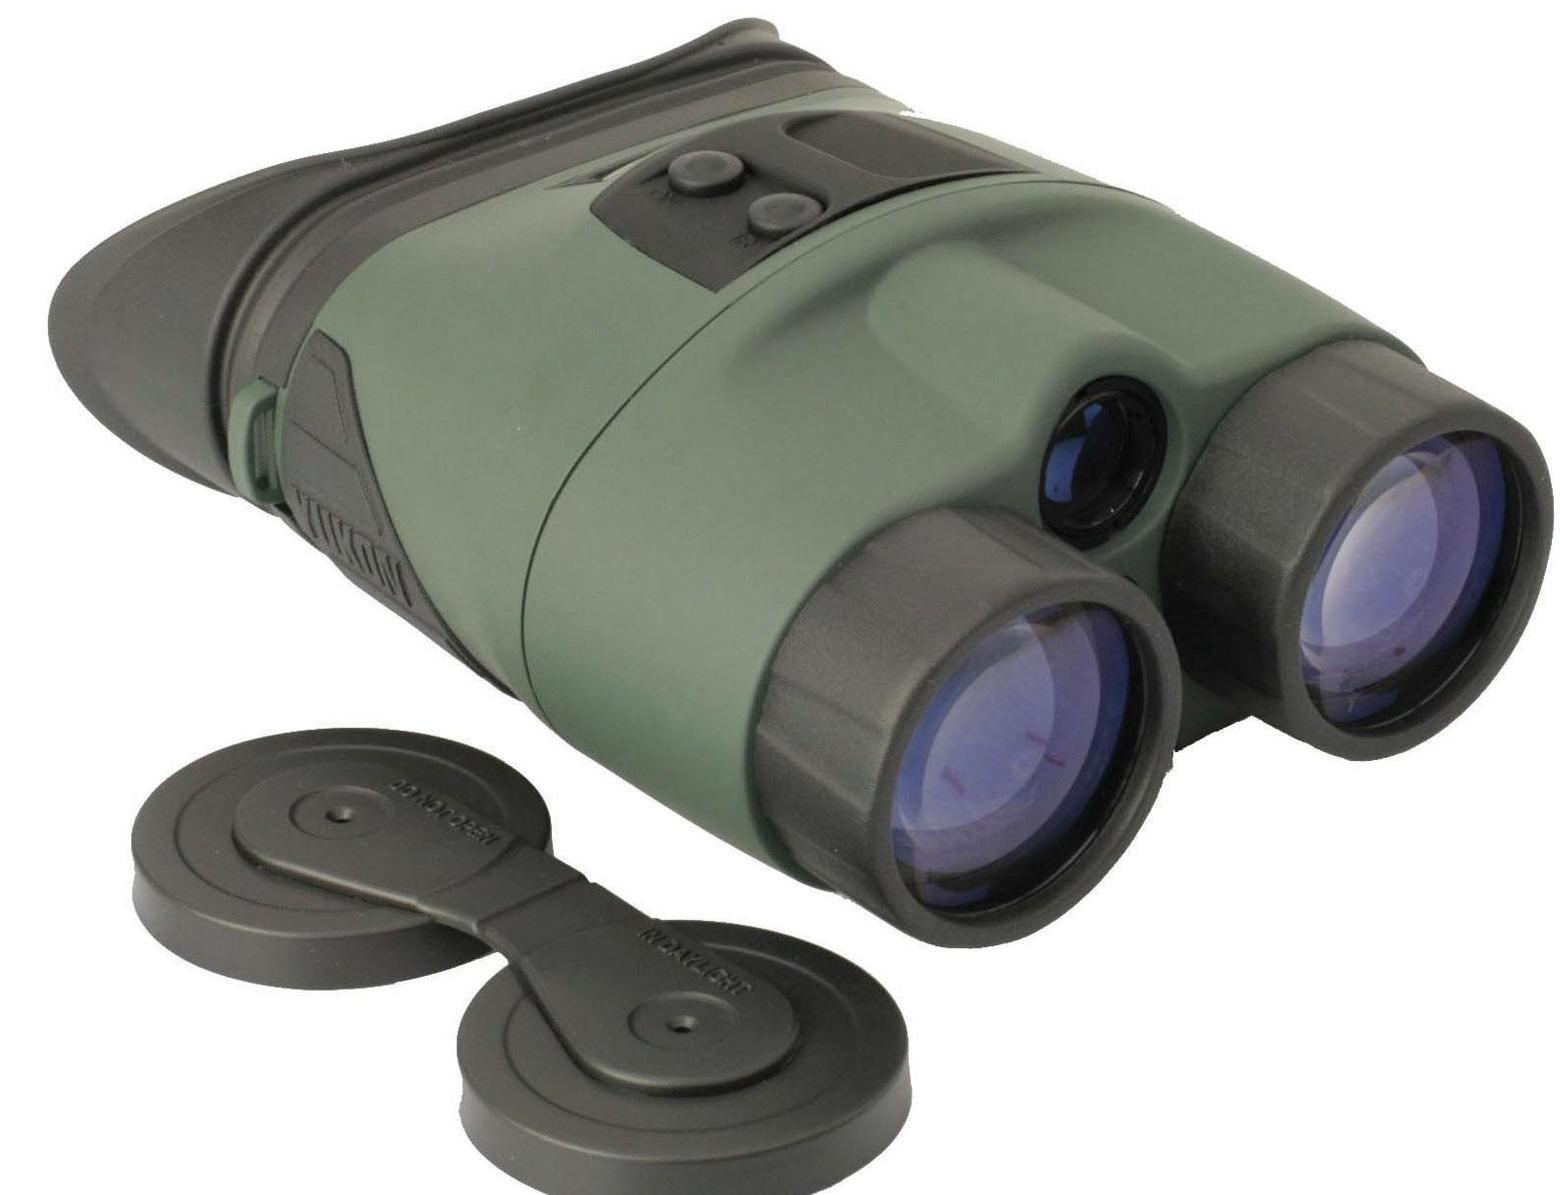 Yukon Tracker 3x42